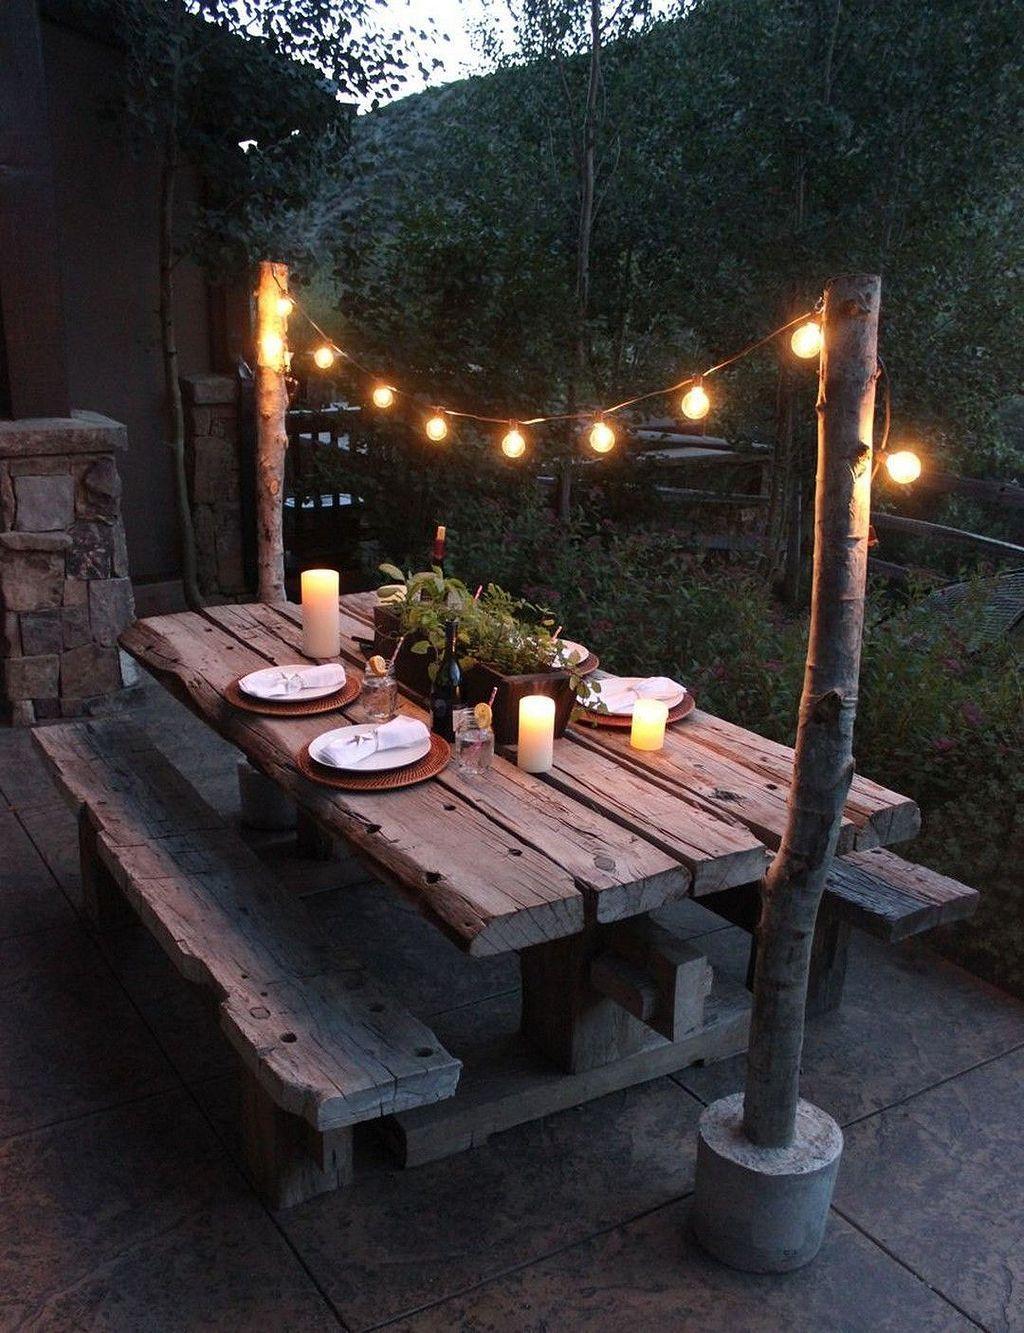 Backyard Picnic Table Dining Area